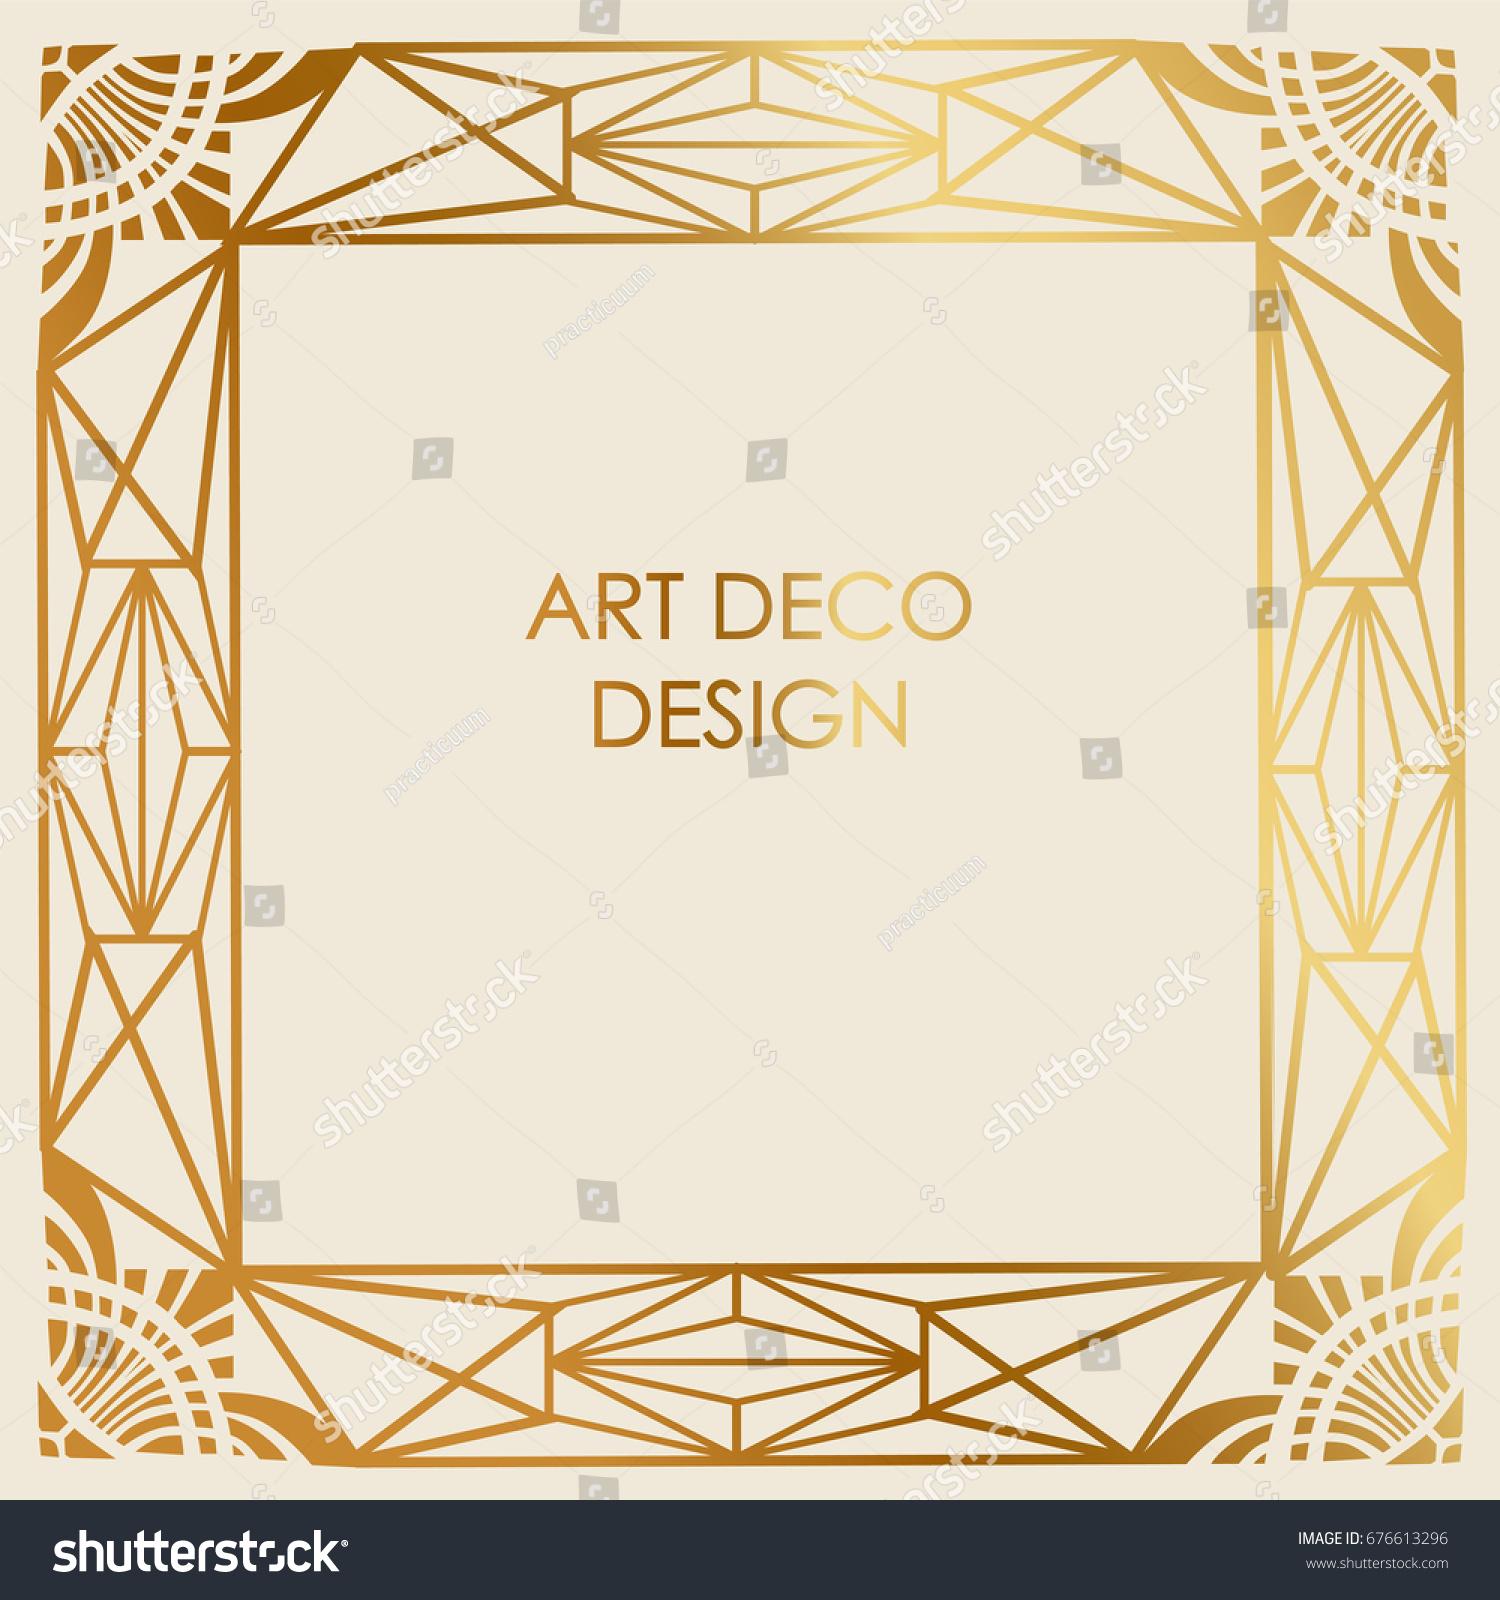 Art Deco Line Design : Art deco design border frame template stock vector